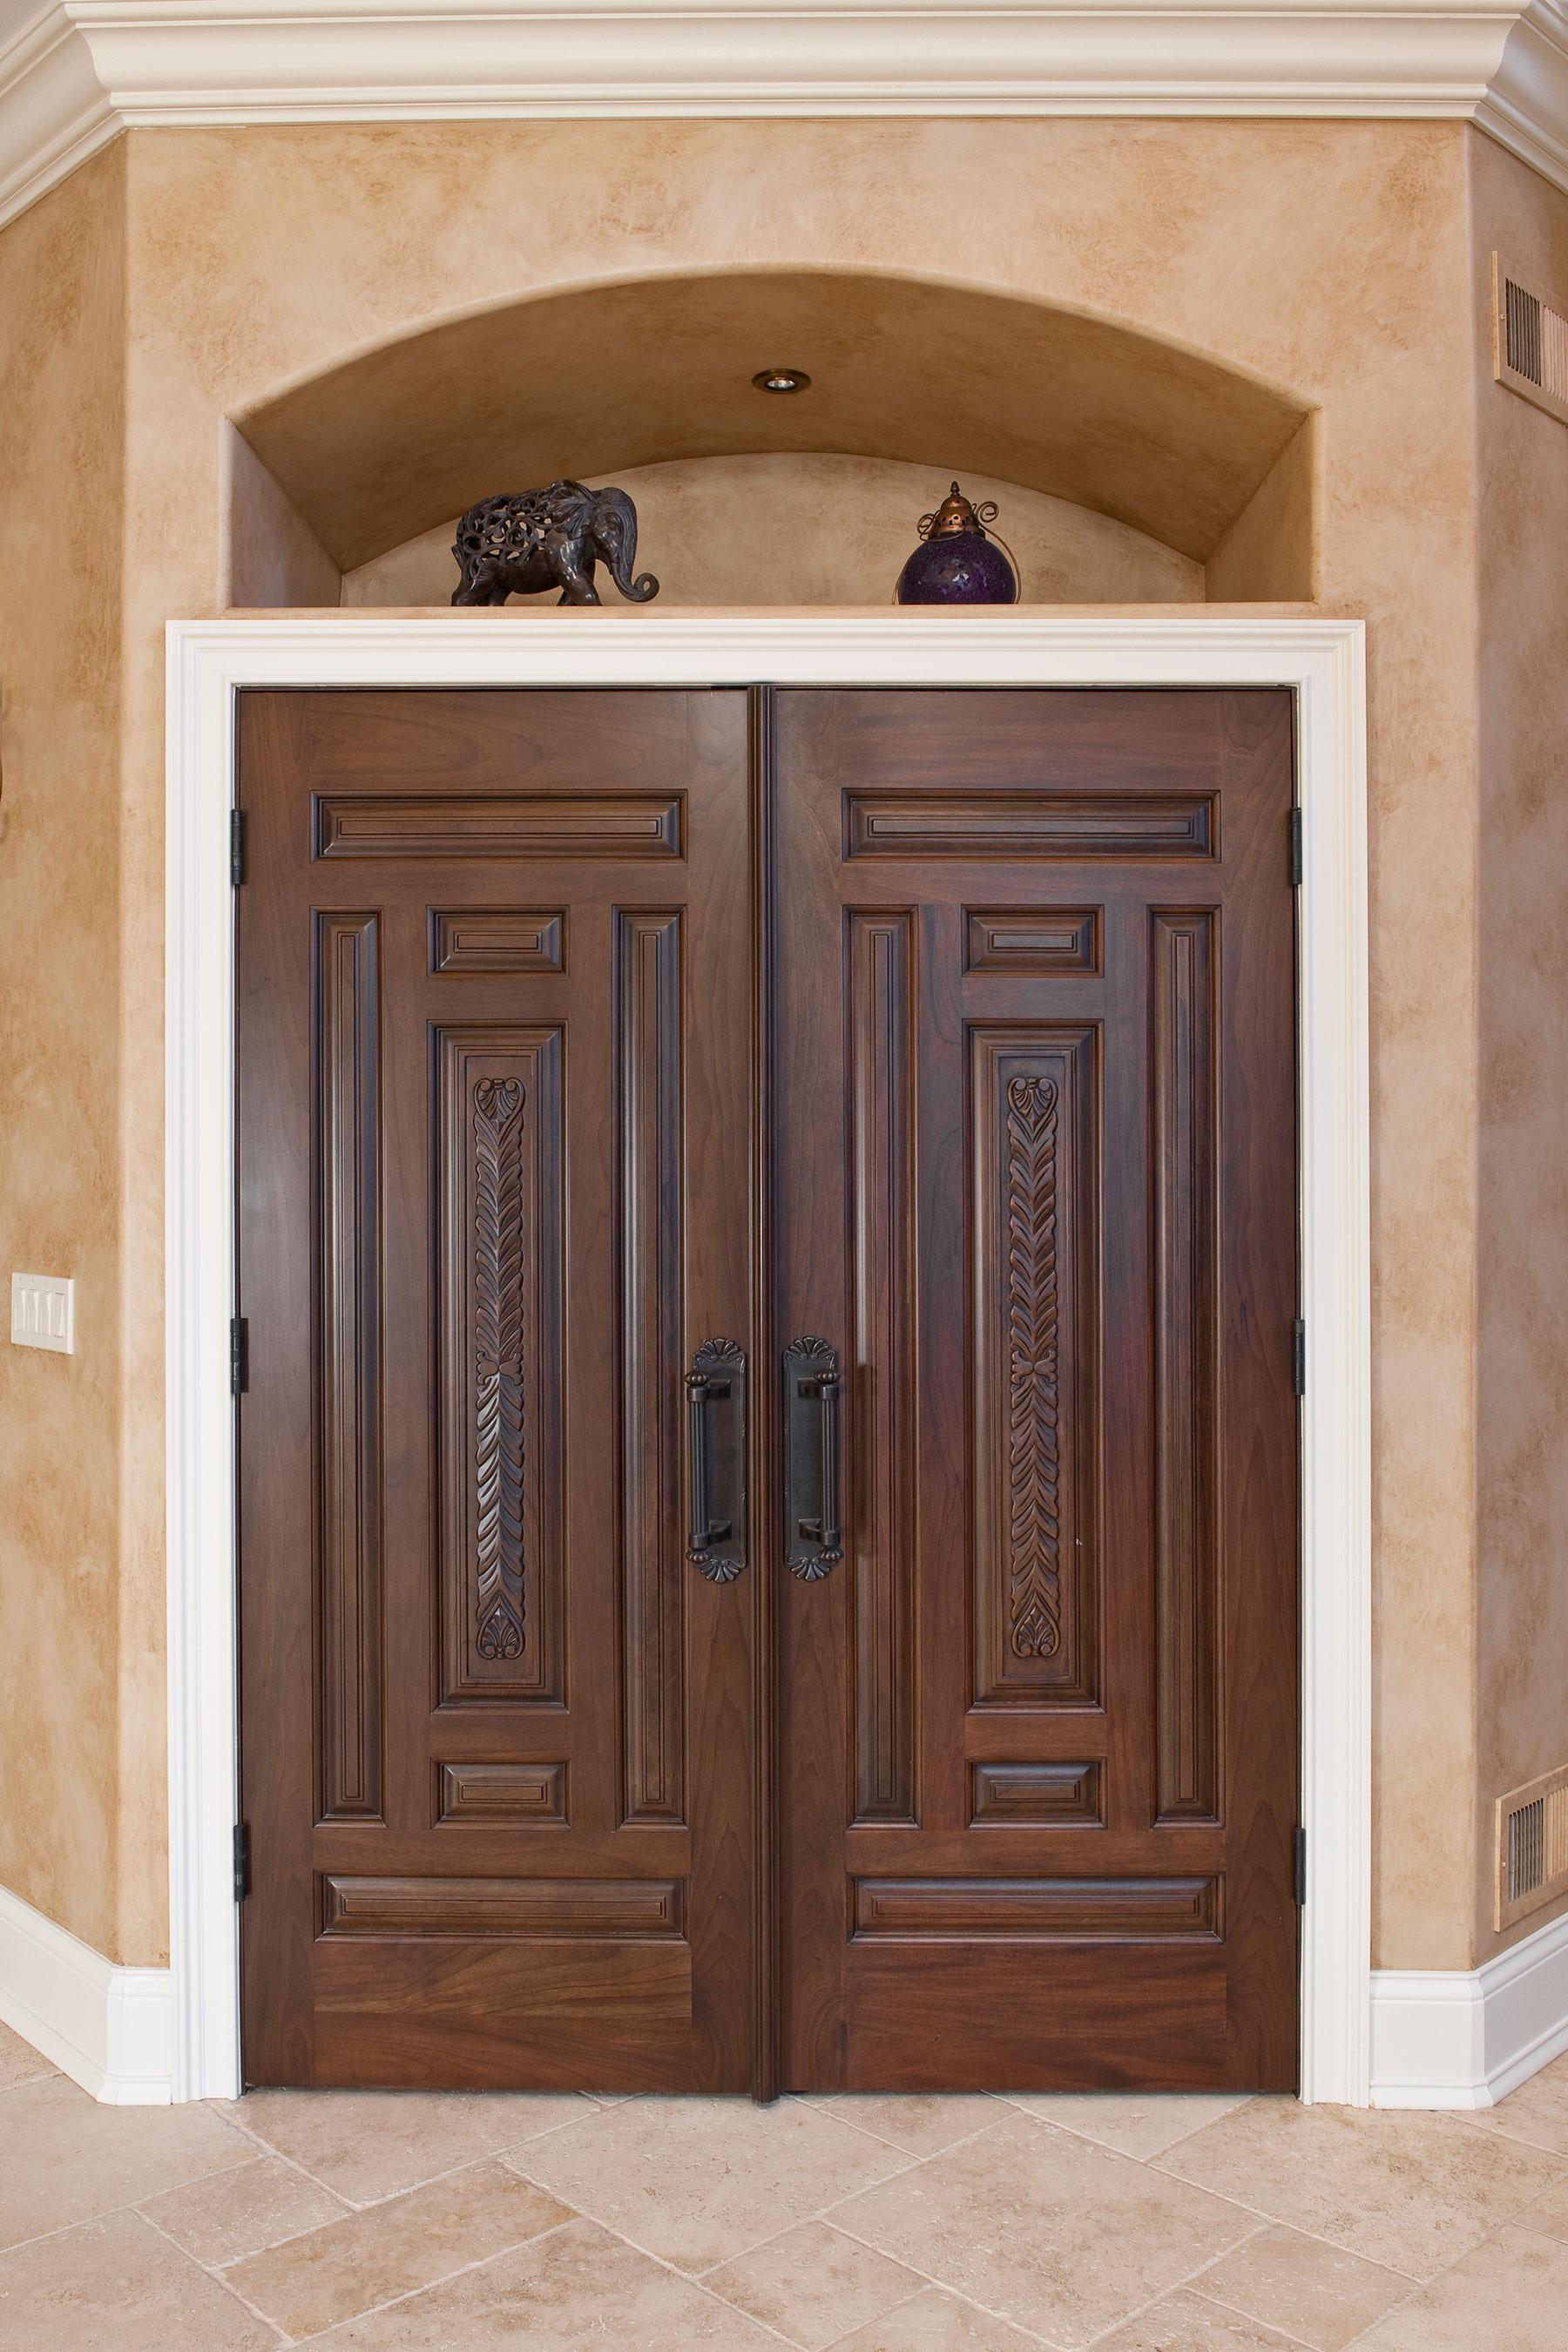 Custom Wood Interior Doors | Solid Wood Interior with Custom Profiles Ridges  DB-580B DD CST - Glenview Doors - Custom Doors in Chicago